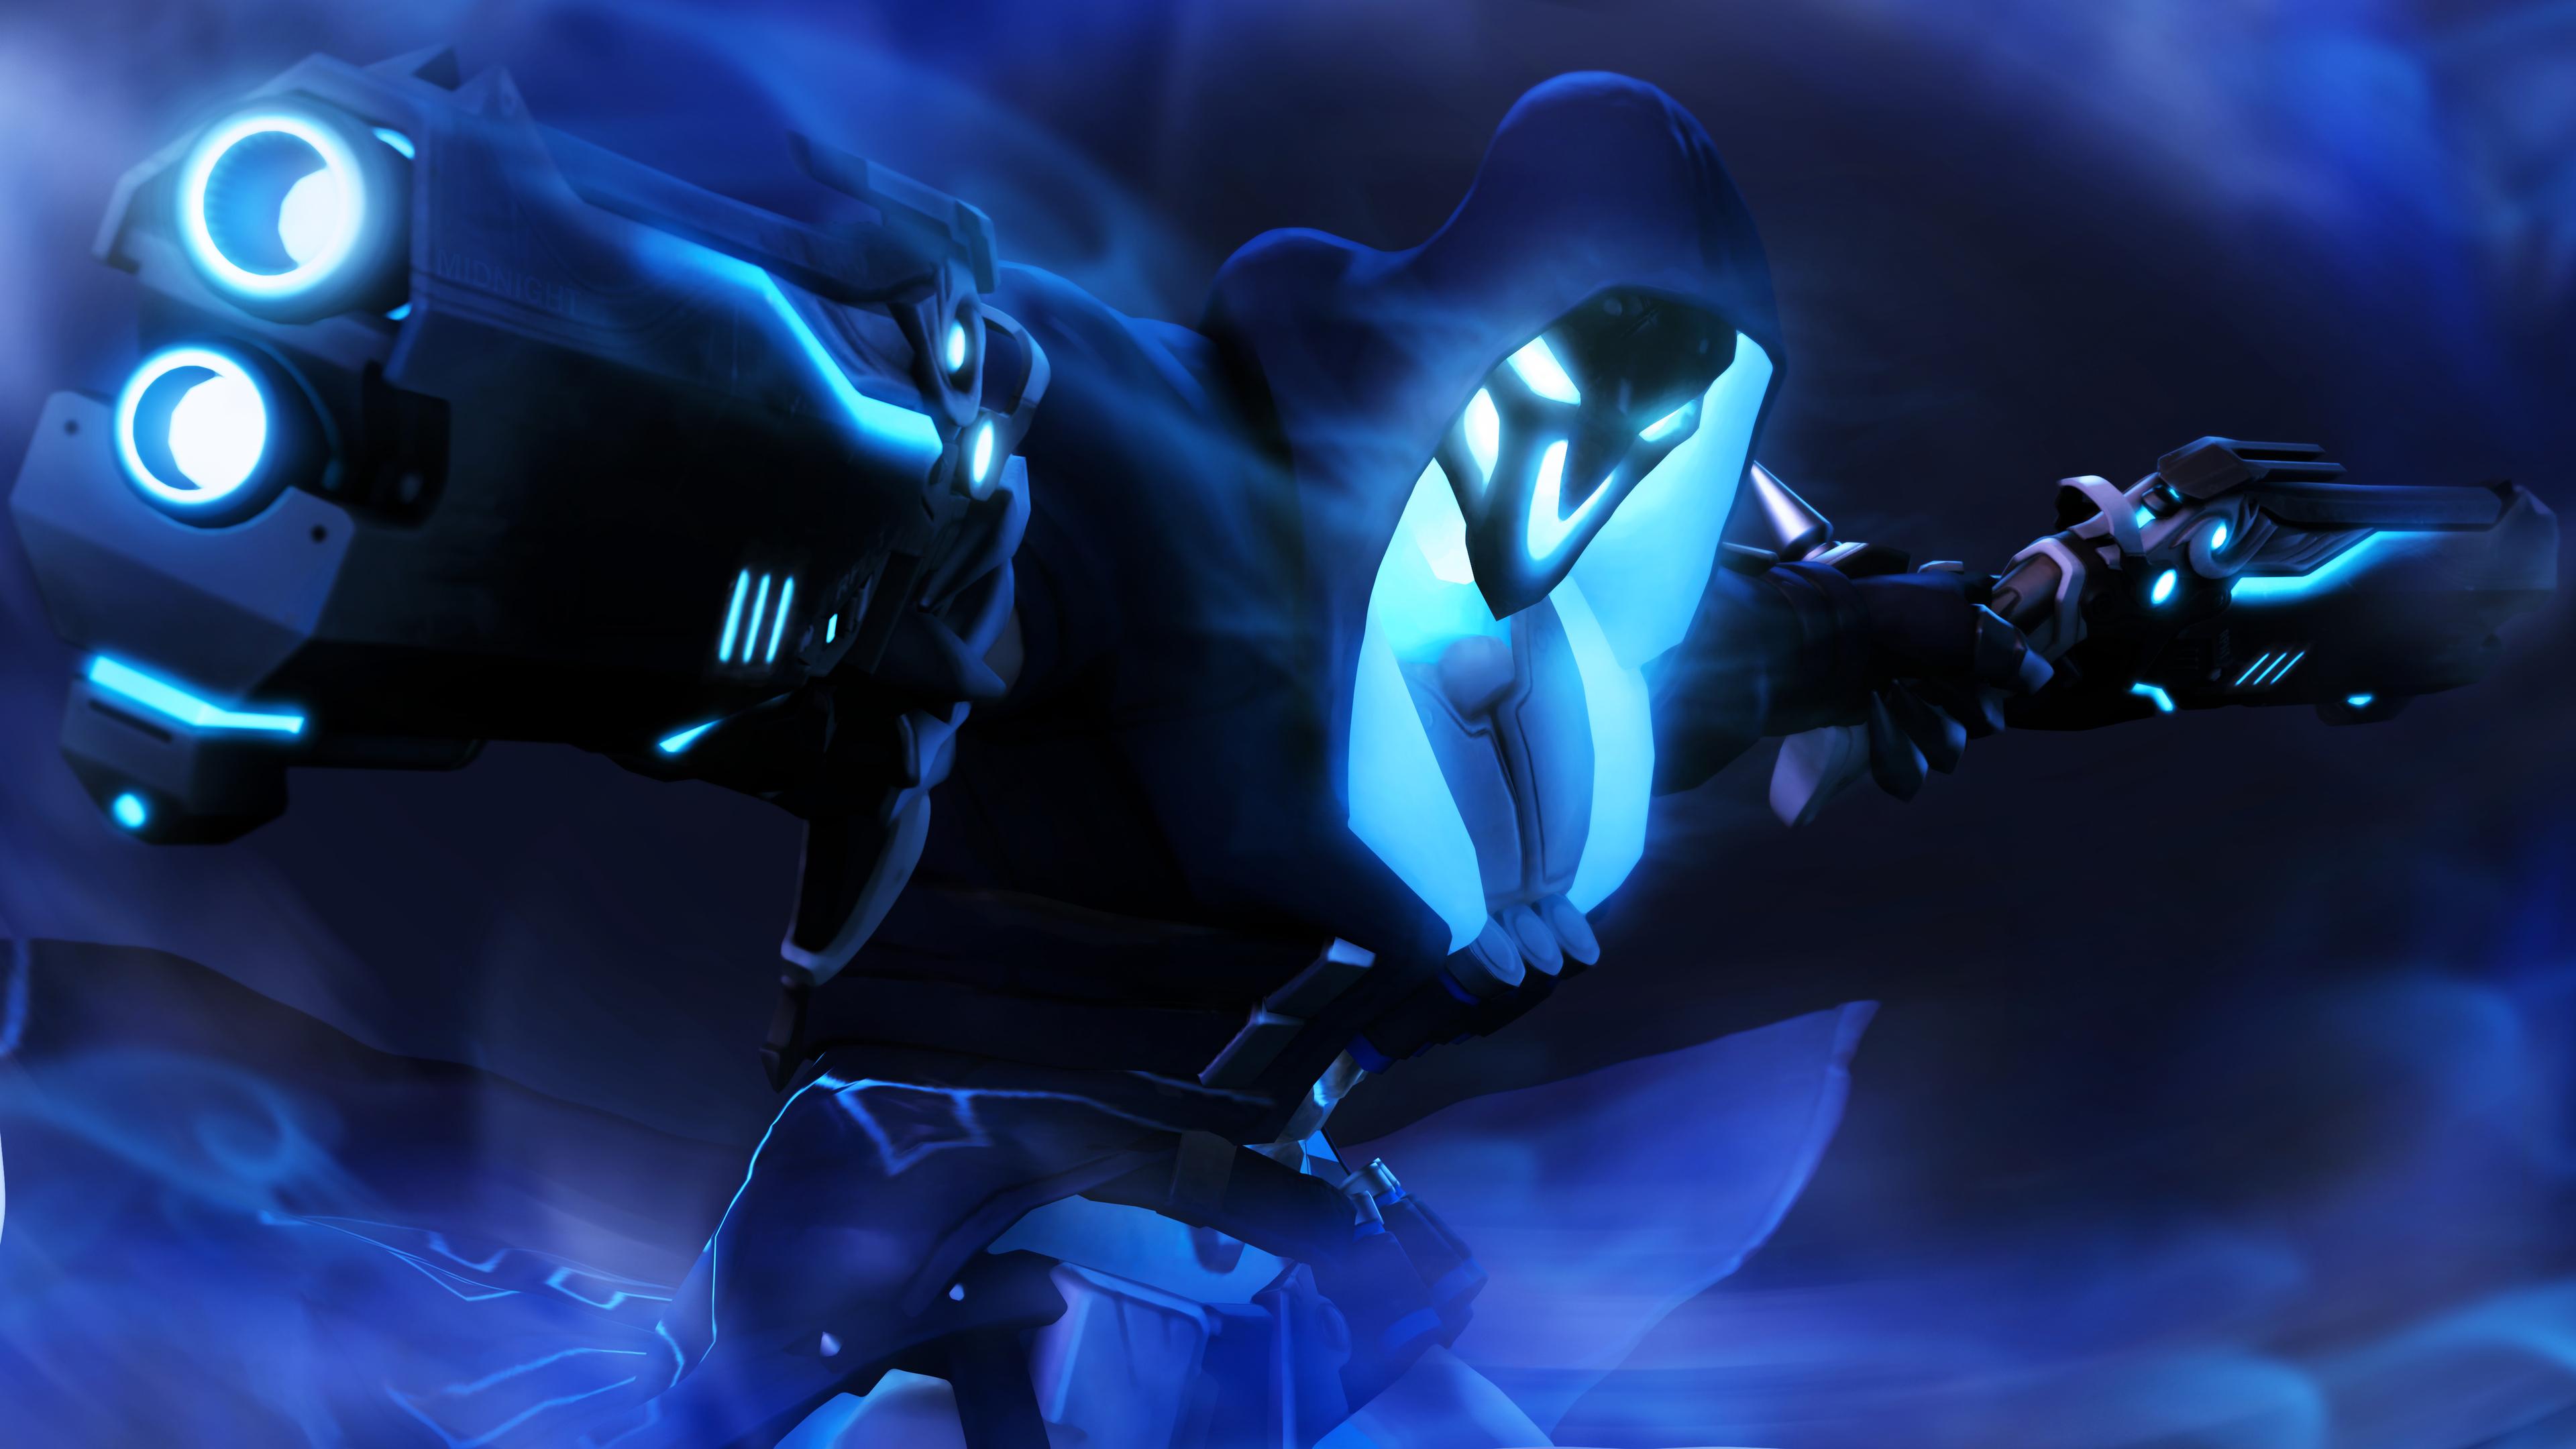 3840x2160 Reaper Overwatch Art 5k 4k HD 4k Wallpapers ...